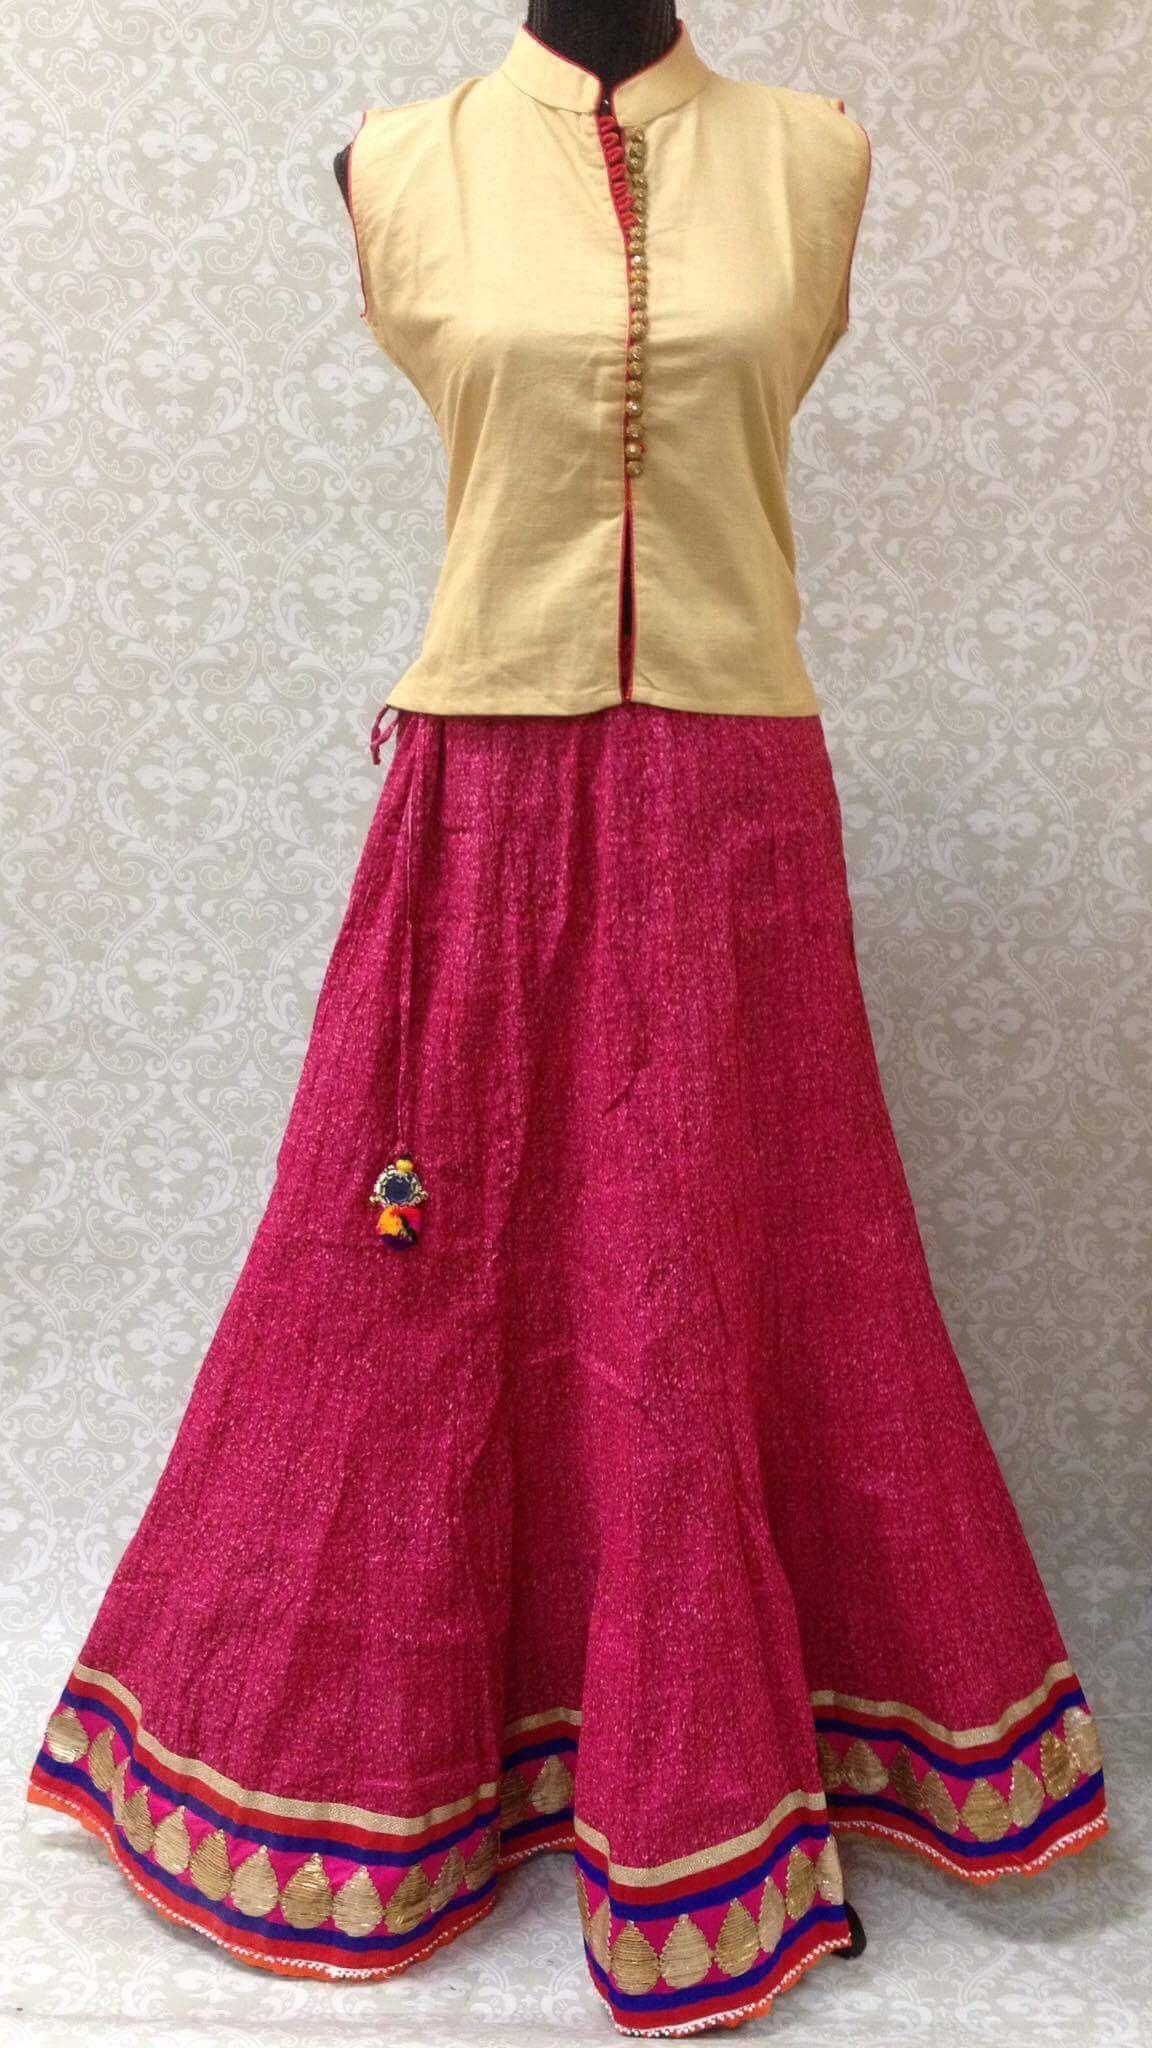 Long Cotton Skirt   Cotton skirt, Skirts and Cotton